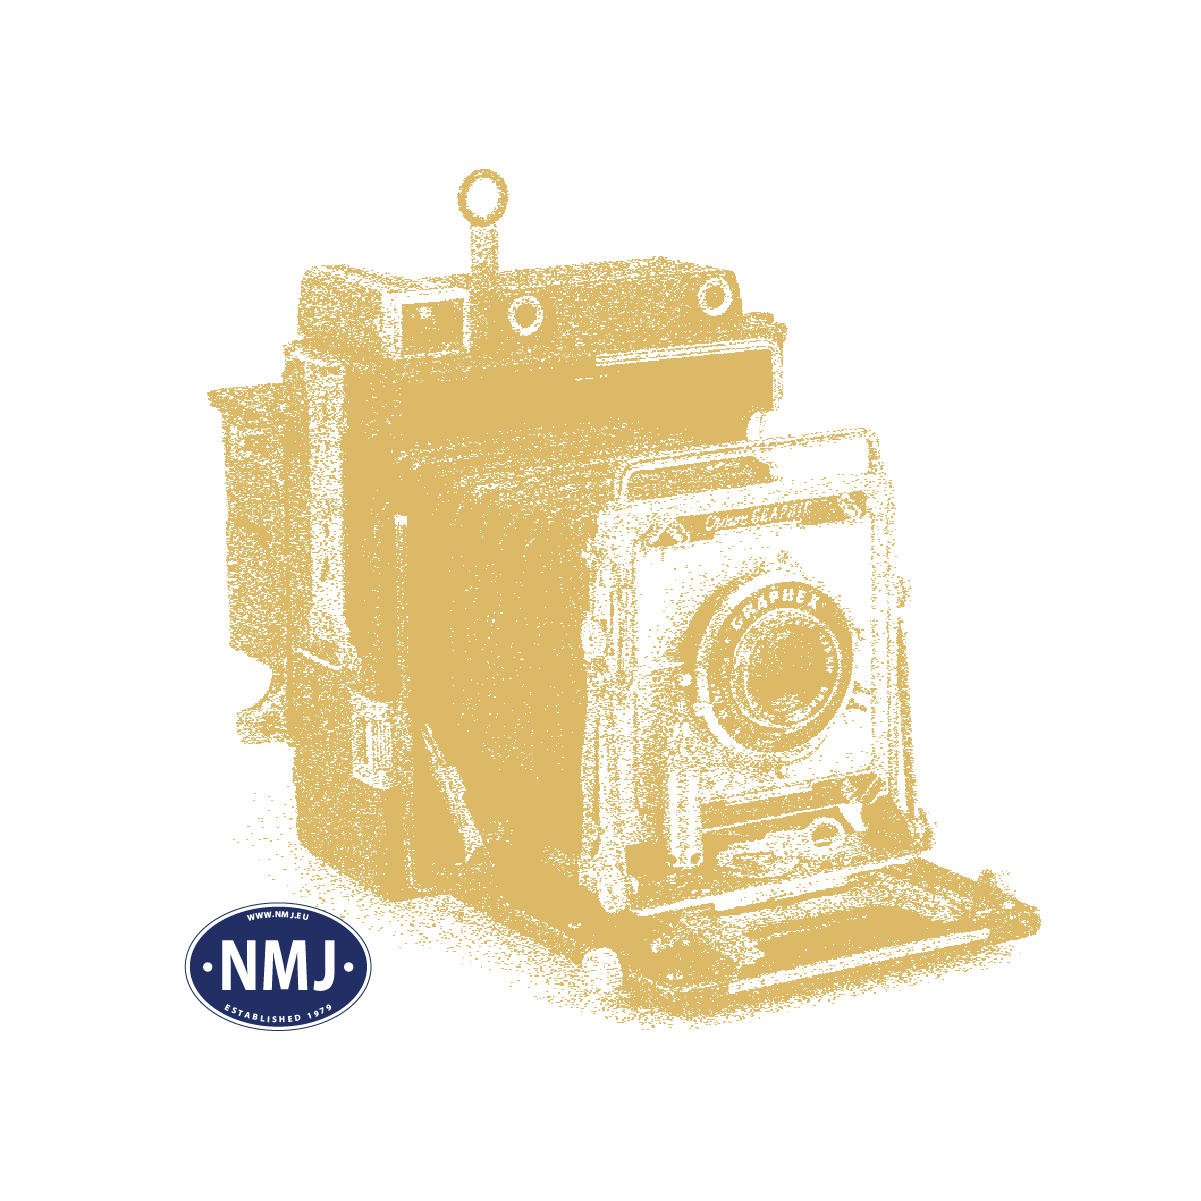 NMJ0.21306 - NMJ Superline NSB DF37.21306, 0-Scala